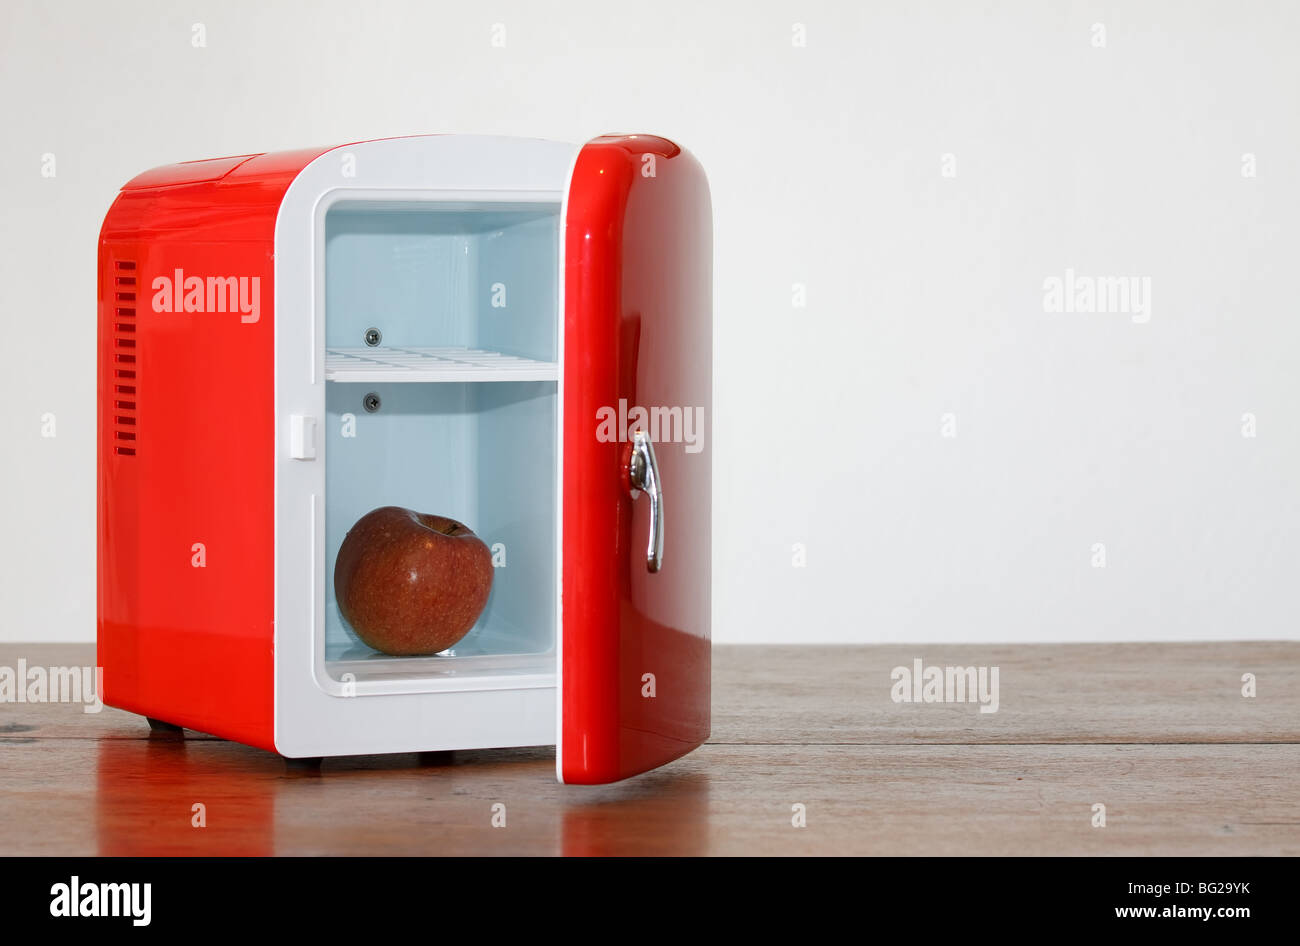 Kleiner Kühlschrank Günstig : Glänzend hell rot mini kühlschrank stockfoto bild  alamy